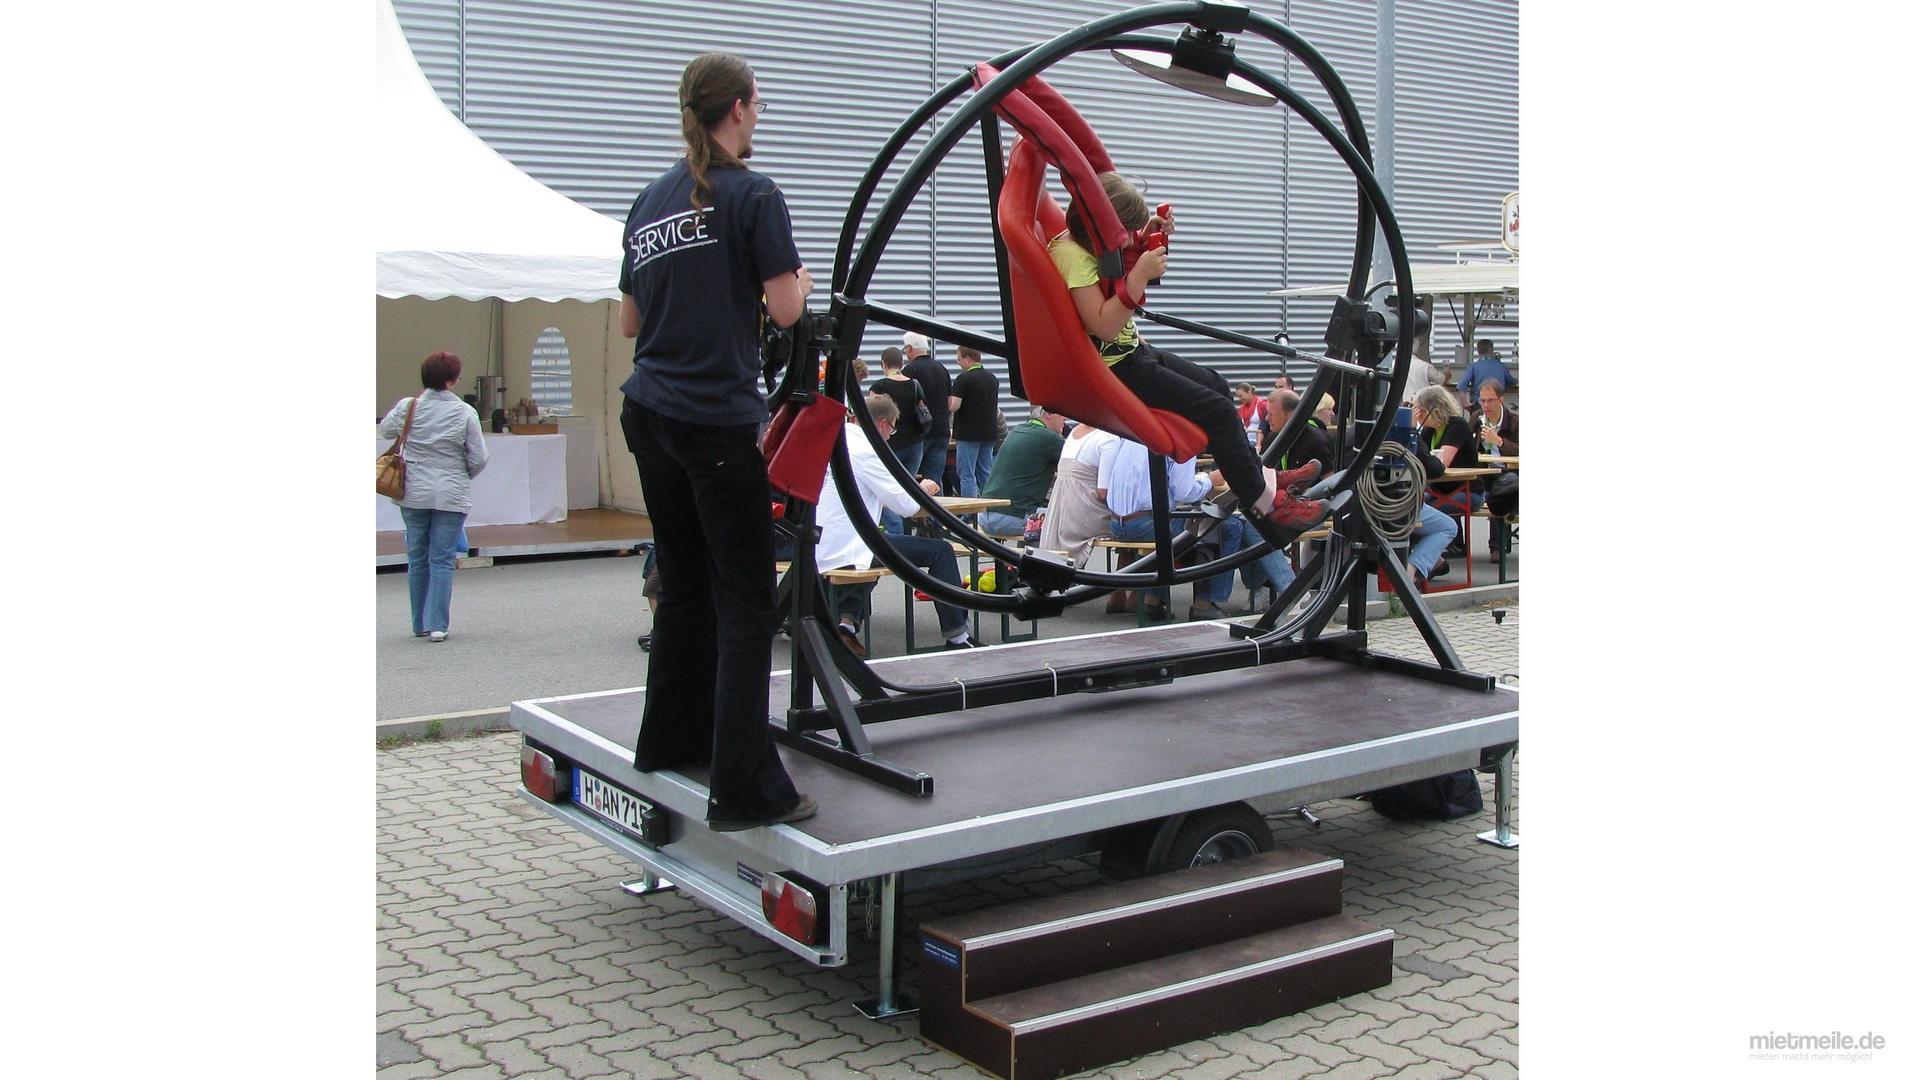 weitere Eventmodule mieten & vermieten - Astrotrainer in Hannover